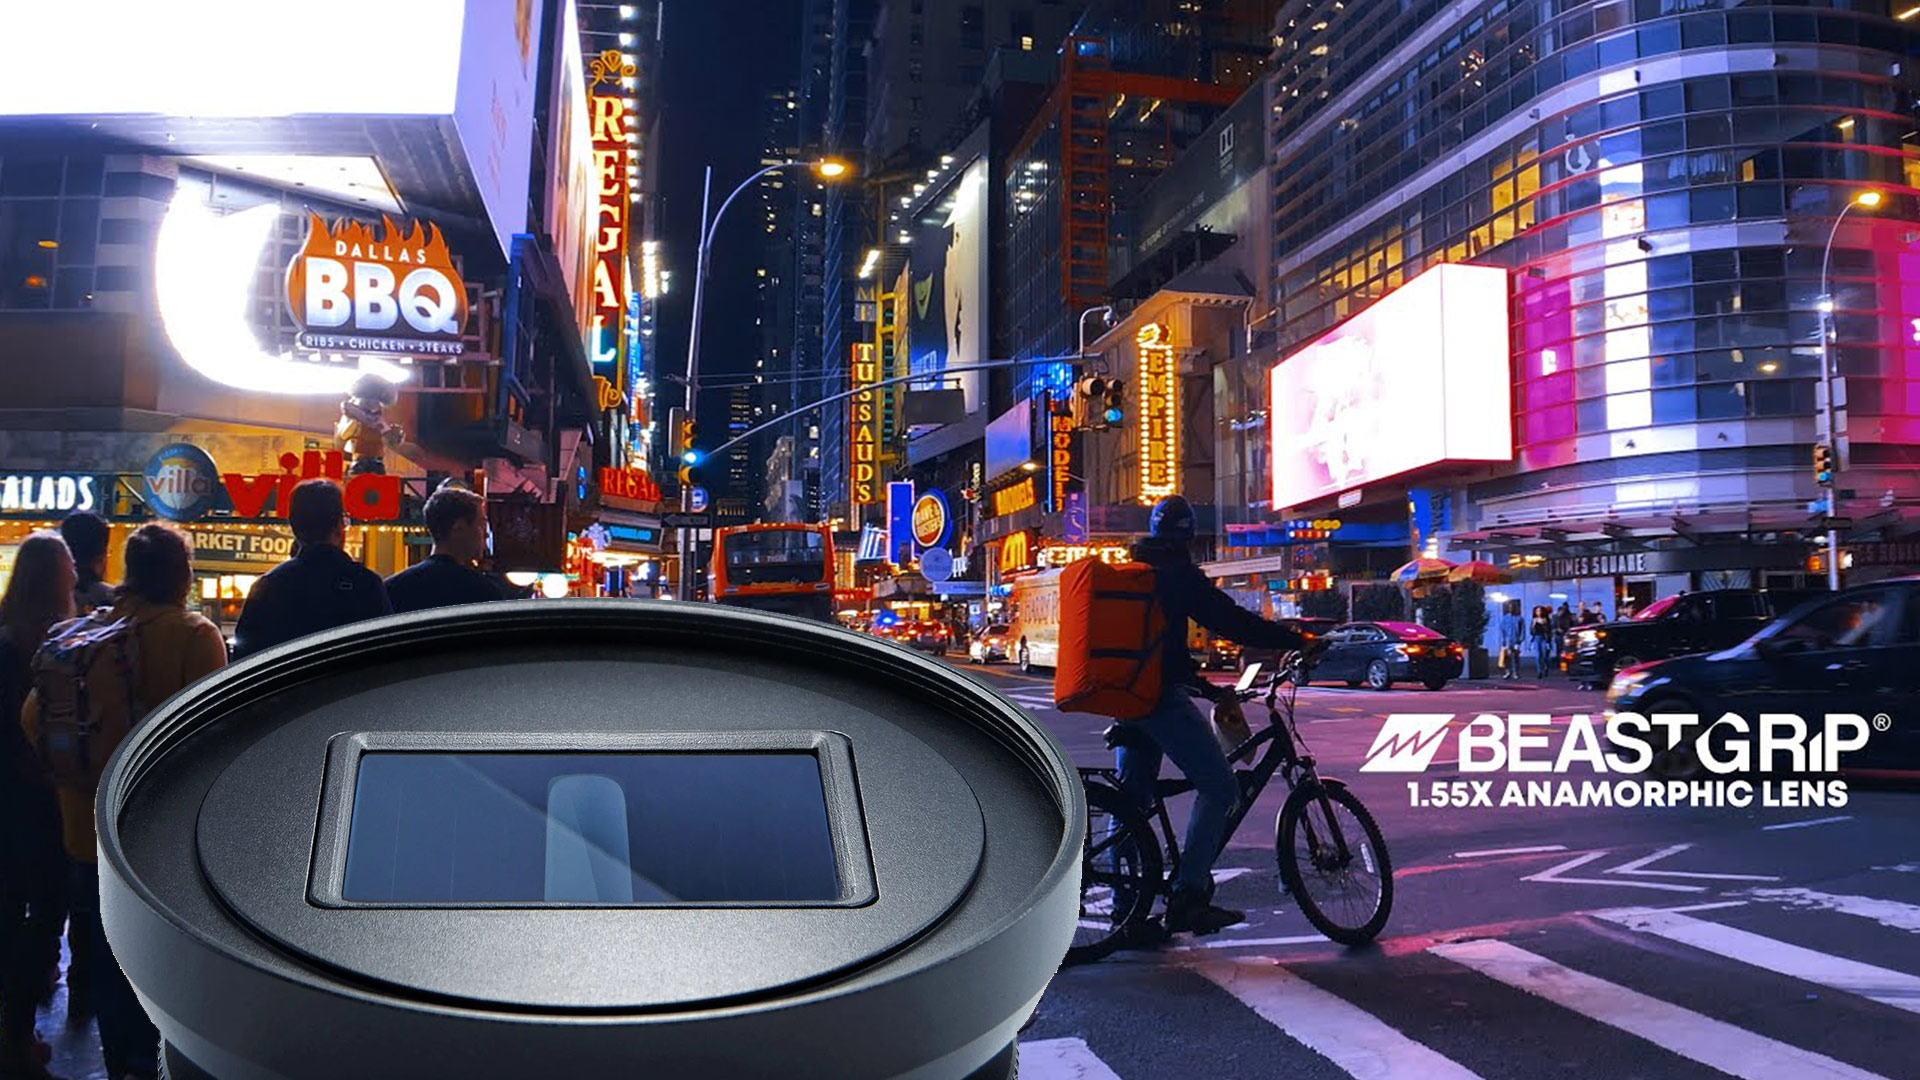 Beastgripが1.55Xスマートフォン用アナモフィックレンズを近く発売予定